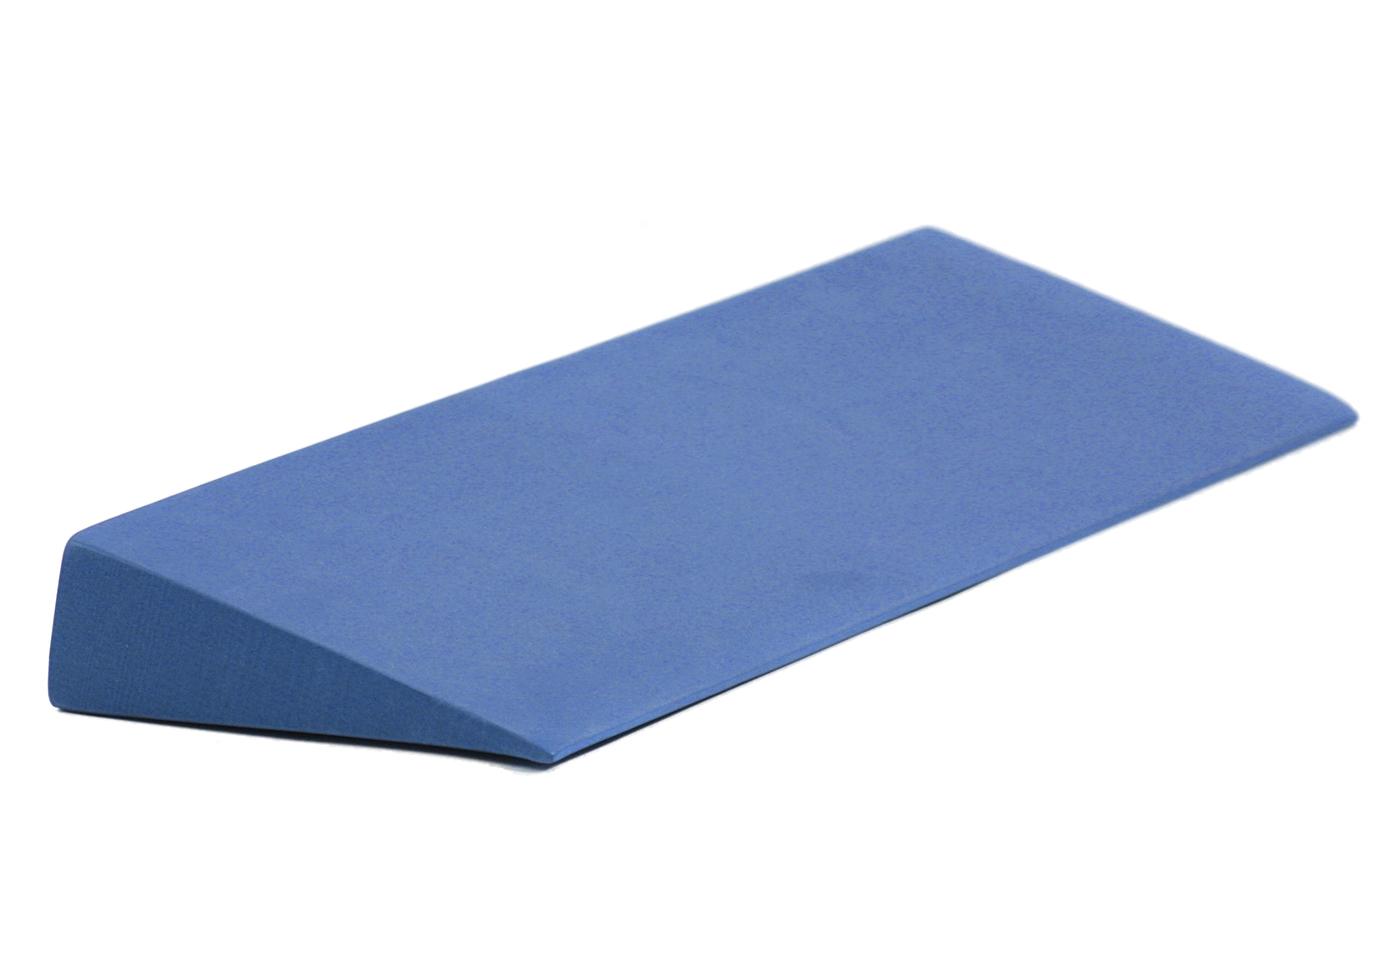 Yoga block - yogiblock - wedge - blue - yoga and pilates block